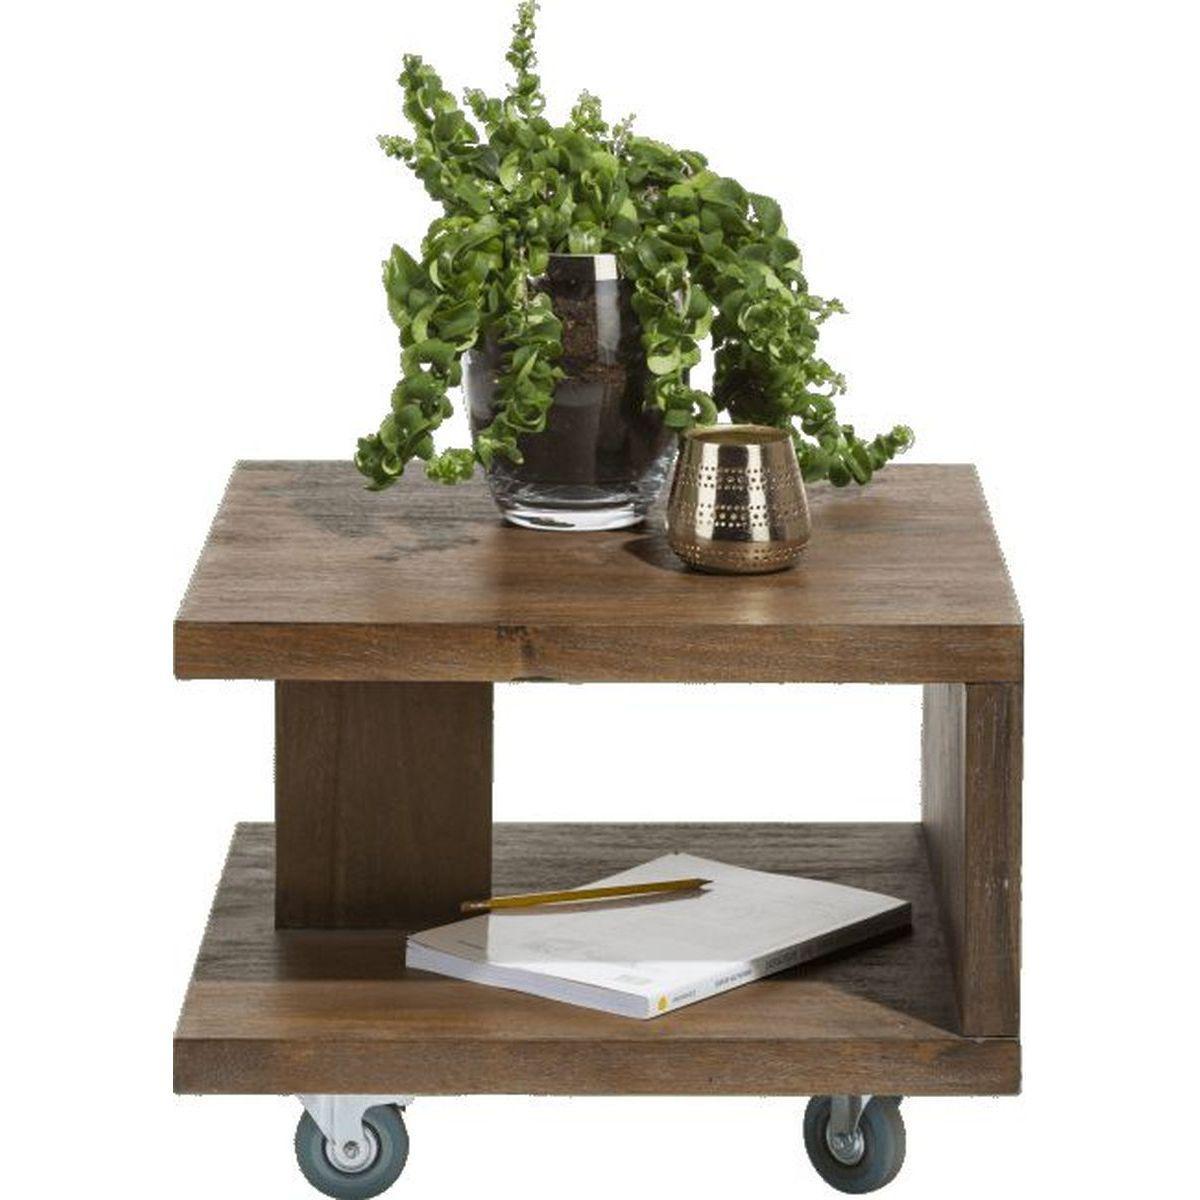 Table d'appoint BOX Henders & Hazel 55x55cm Tramwood Walnut